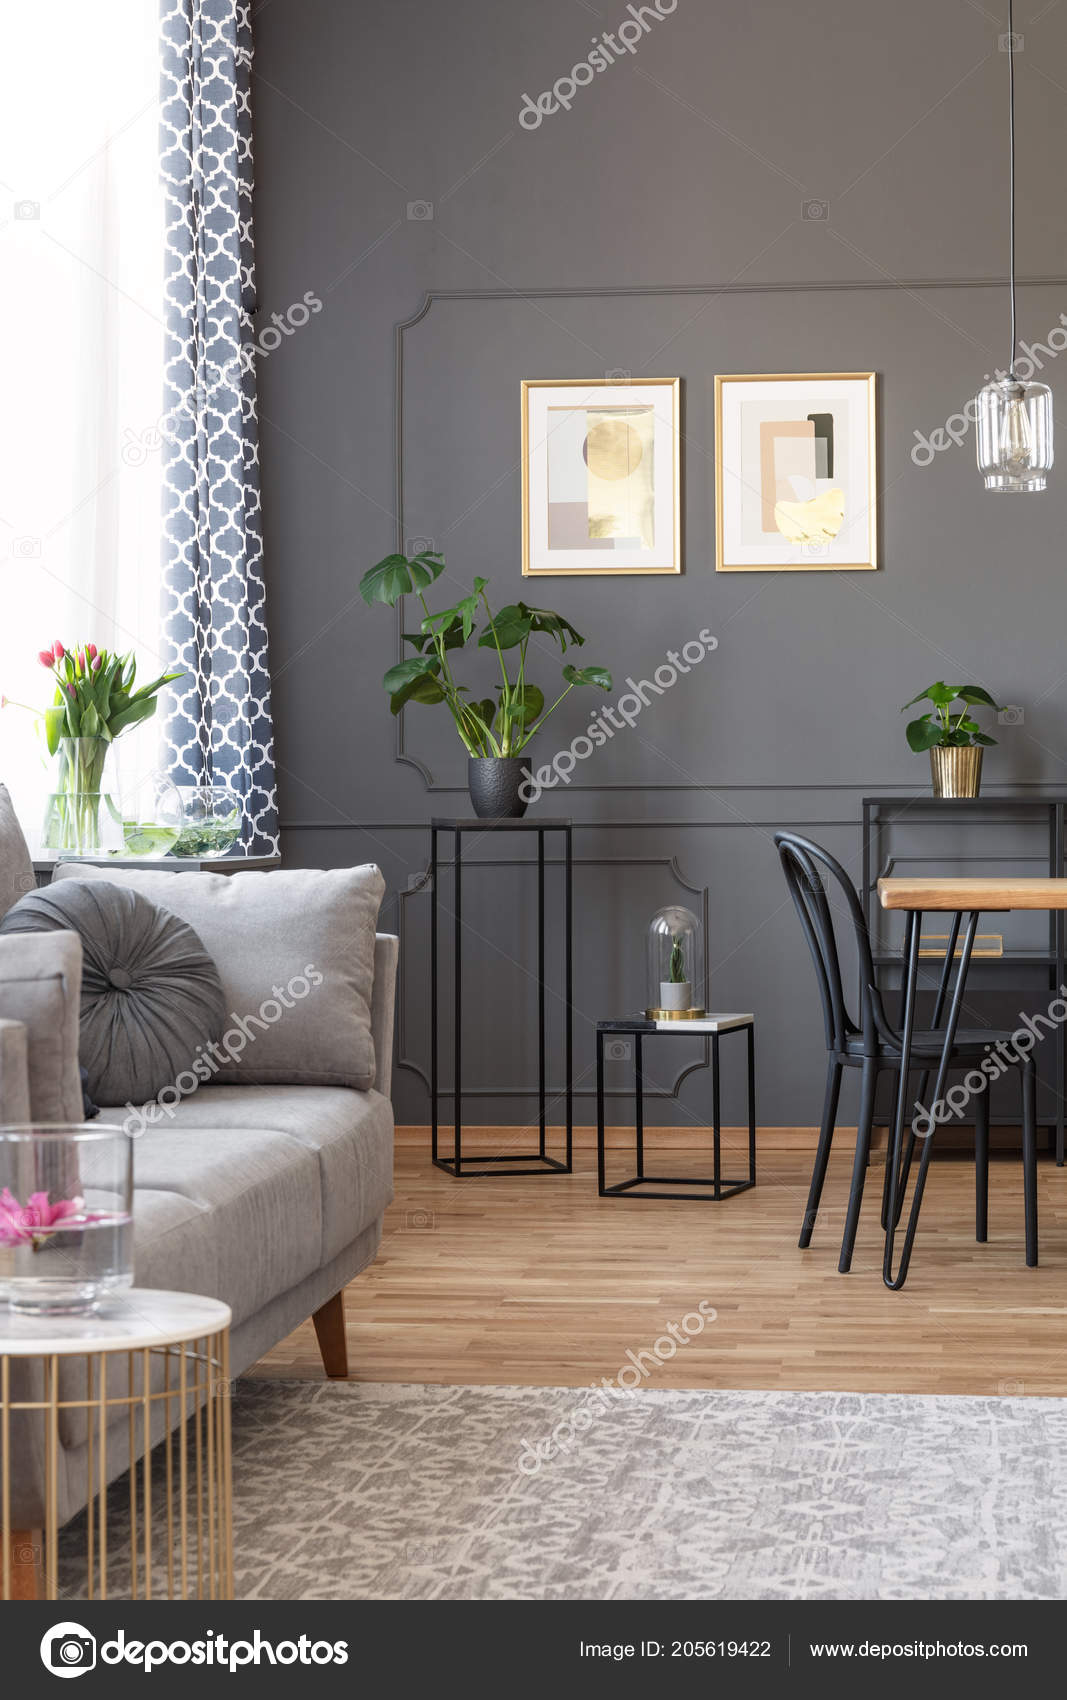 Grey Sofa Carpet Living Room Interior Posters Wall Plants ...